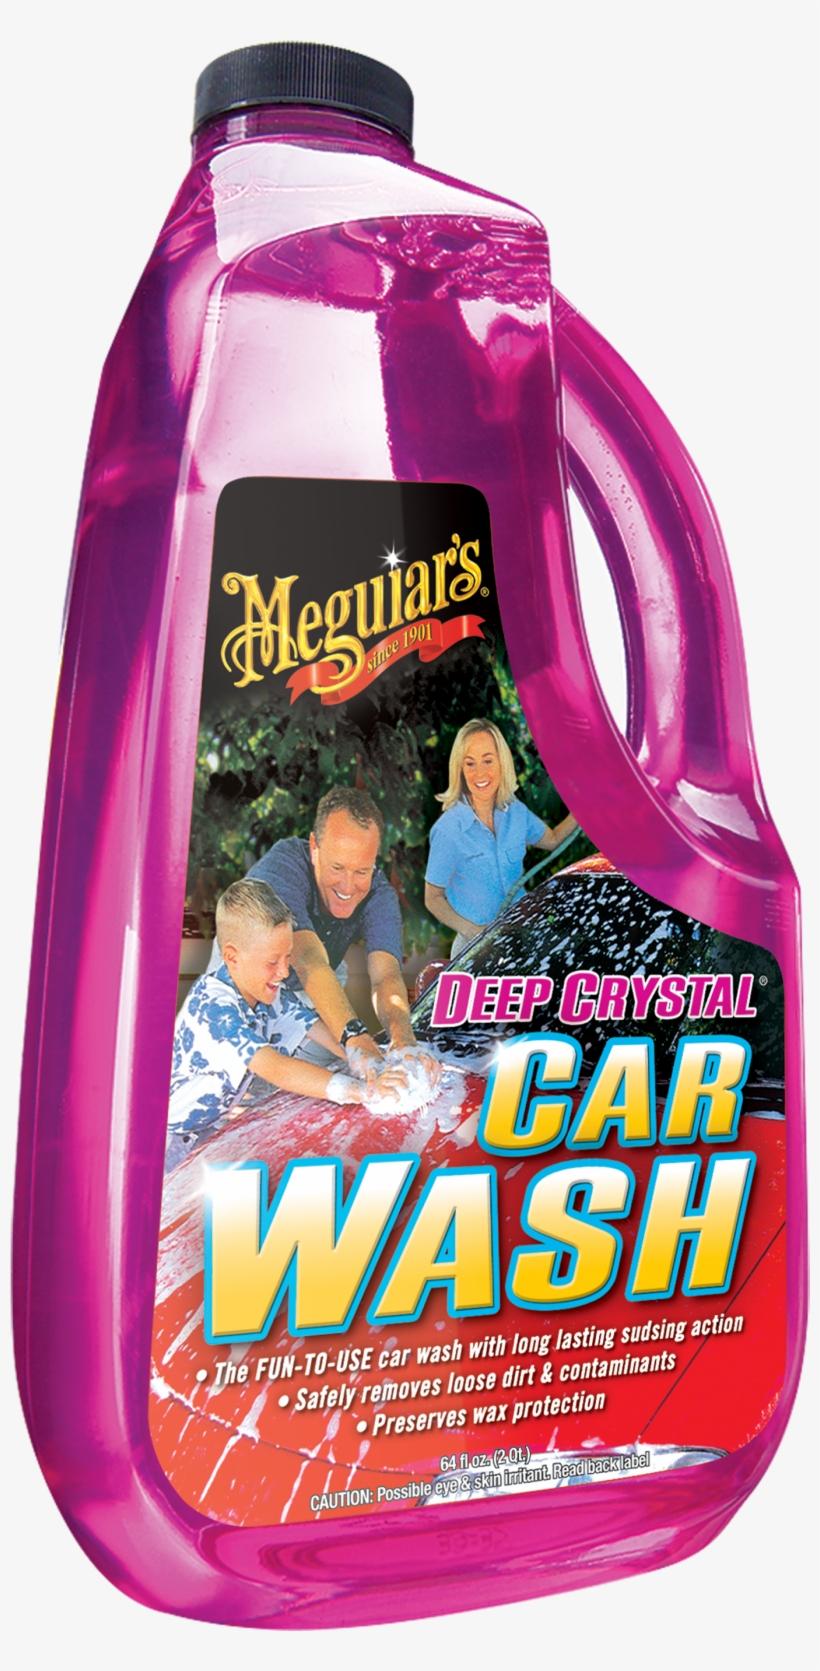 Deep Crystal® Car Wash - Meguiars 64 Oz Deep Crystal Car Wash G10464, transparent png #471797